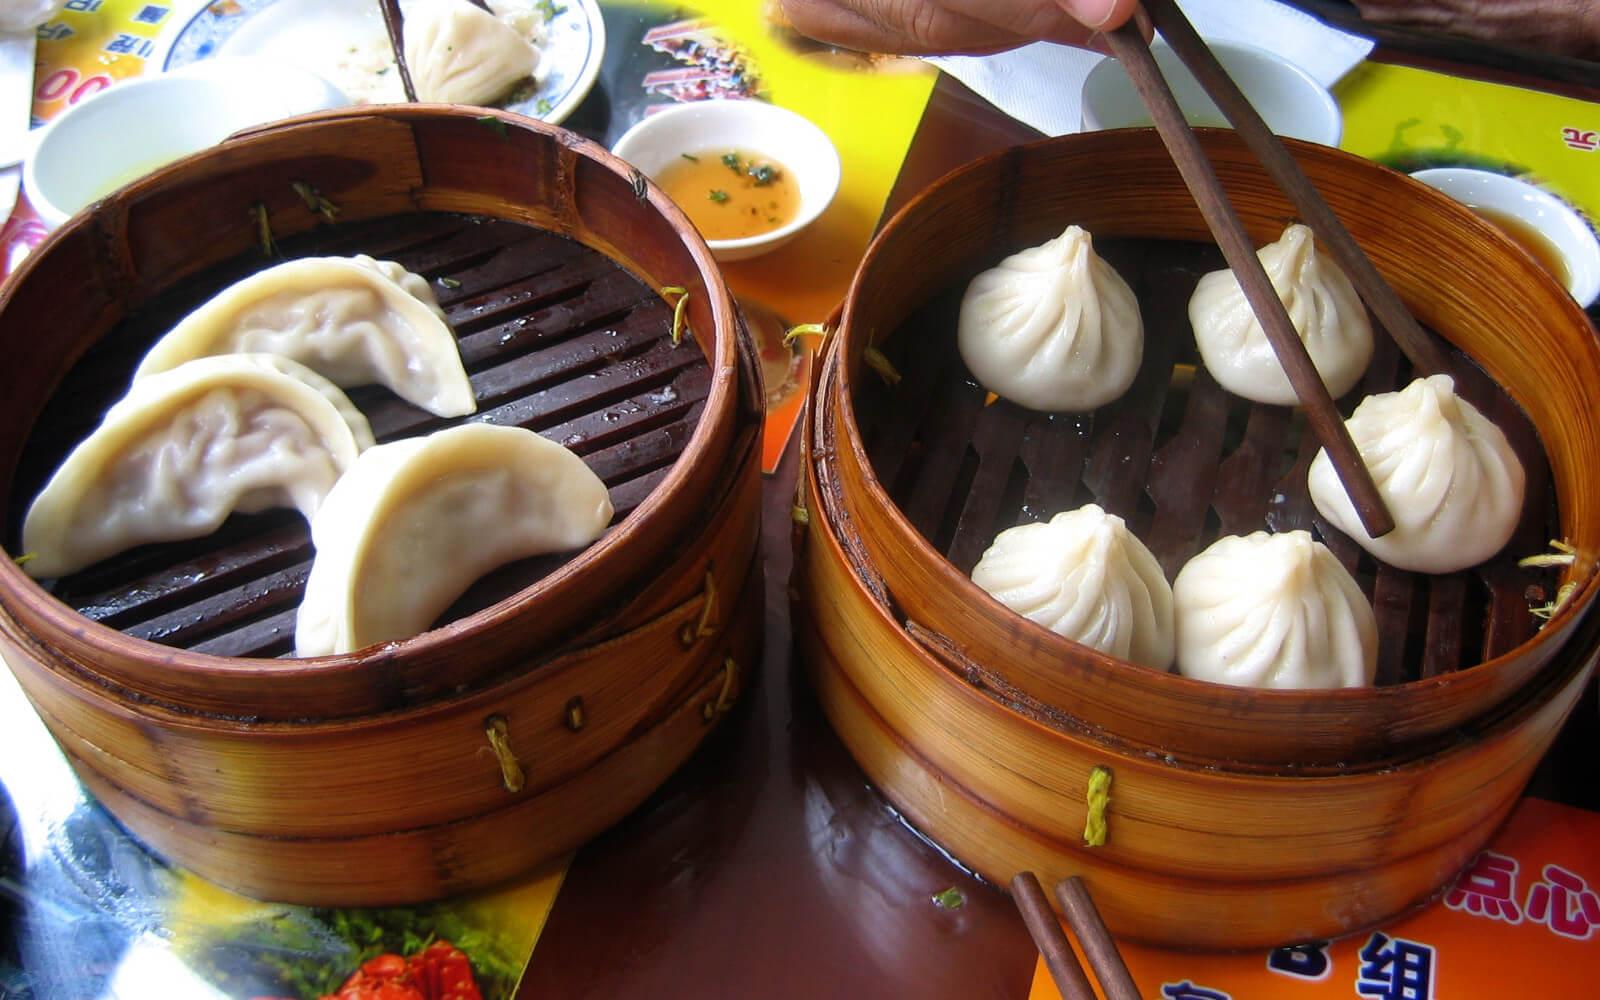 饺子 und 包子 – typisch chinesische Gerichte